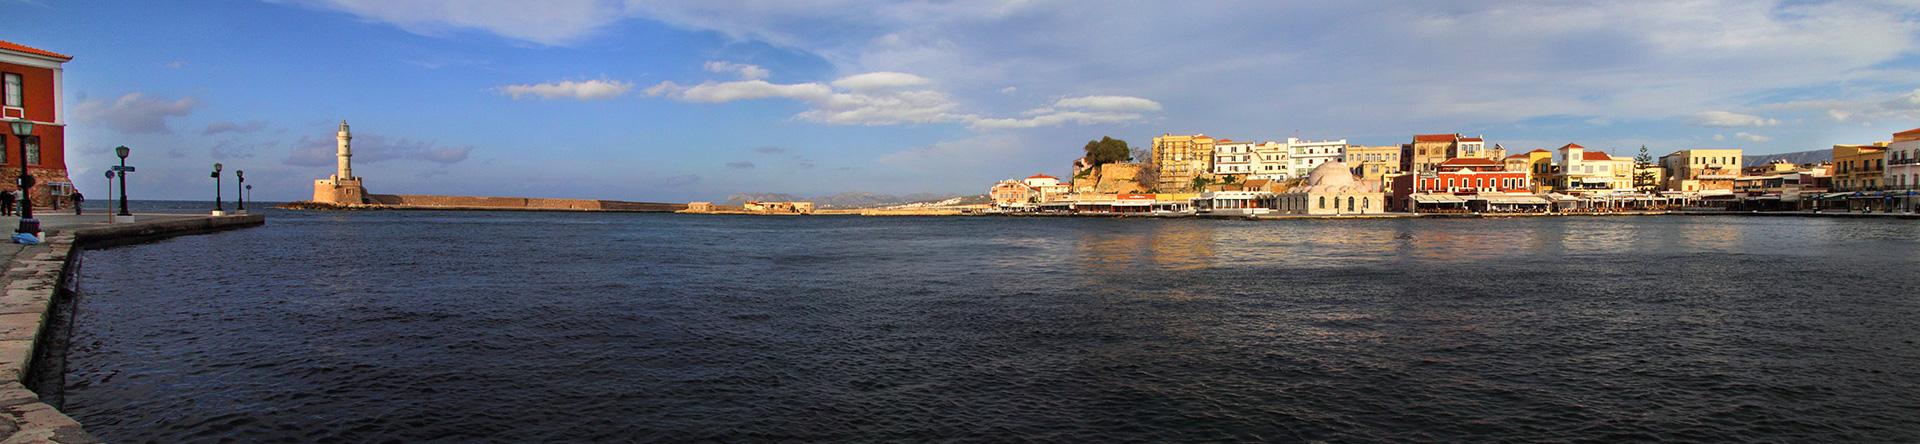 Chania-2010-03-08-83-Panorama-L